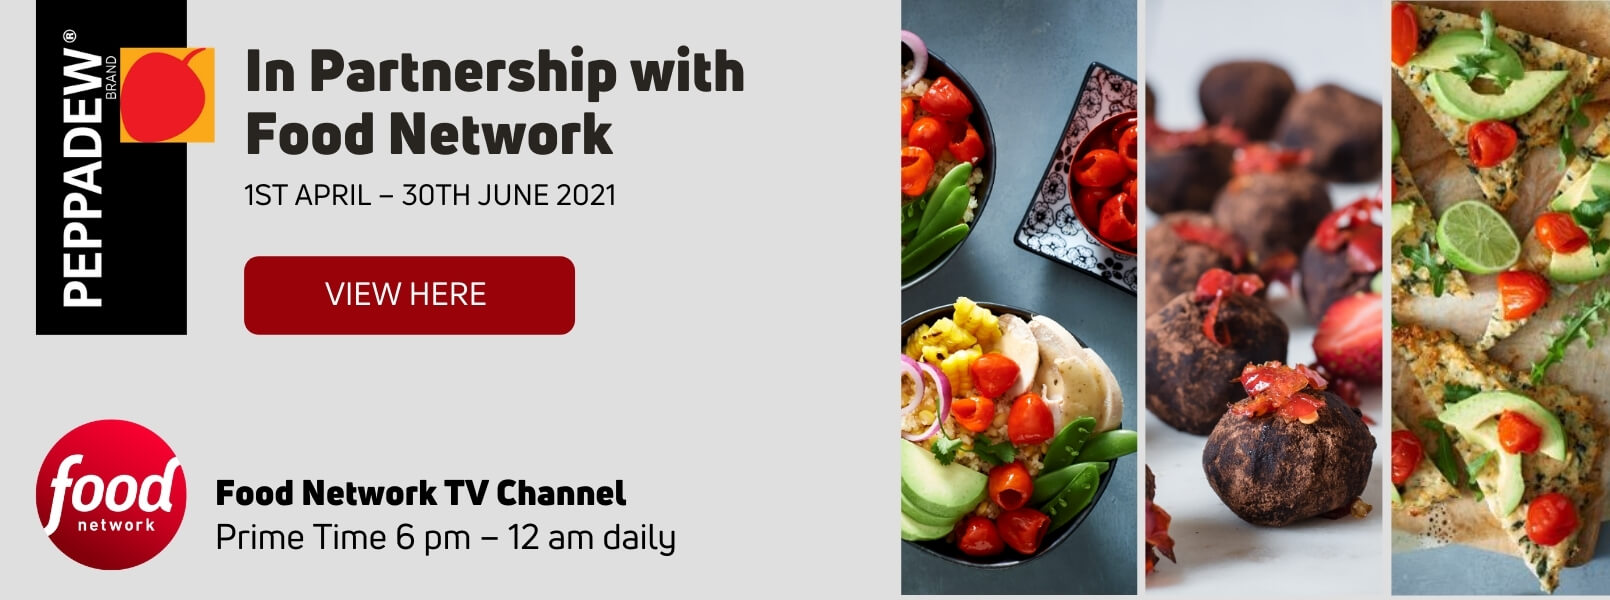 peppadew food network sponsorship